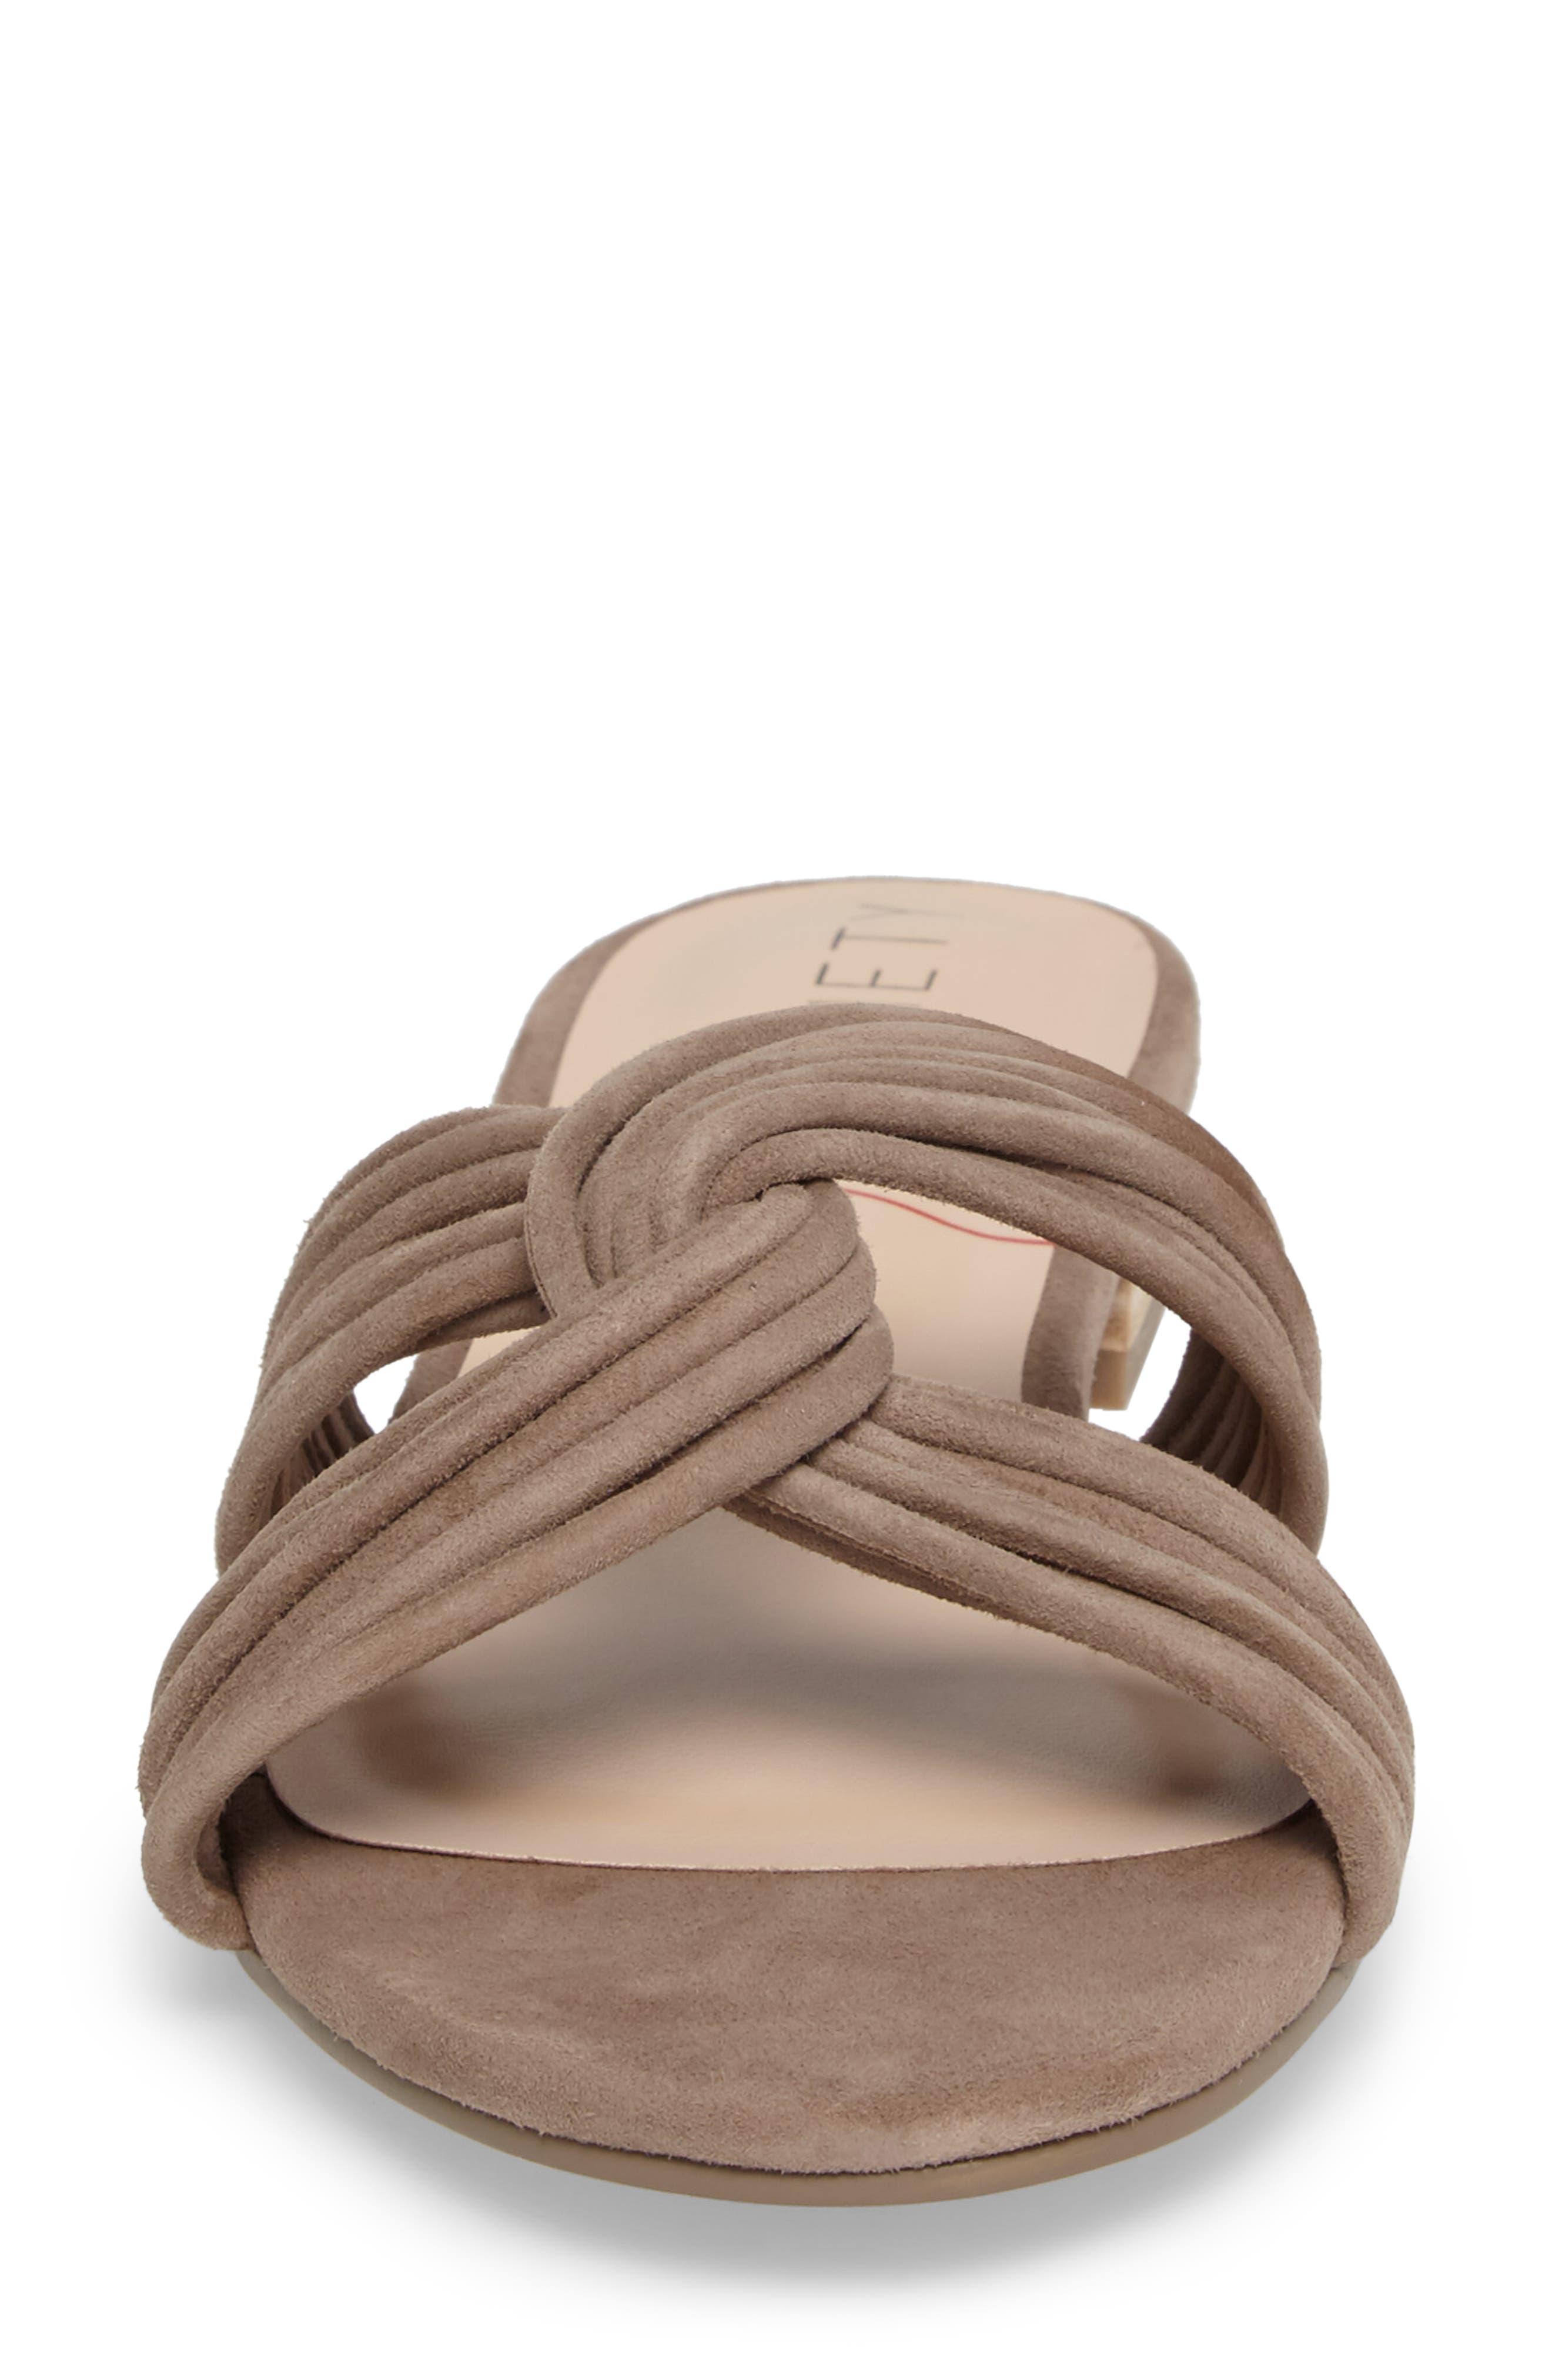 SOLE SOCIETY, Dahlia Flat Sandal, Alternate thumbnail 4, color, 240